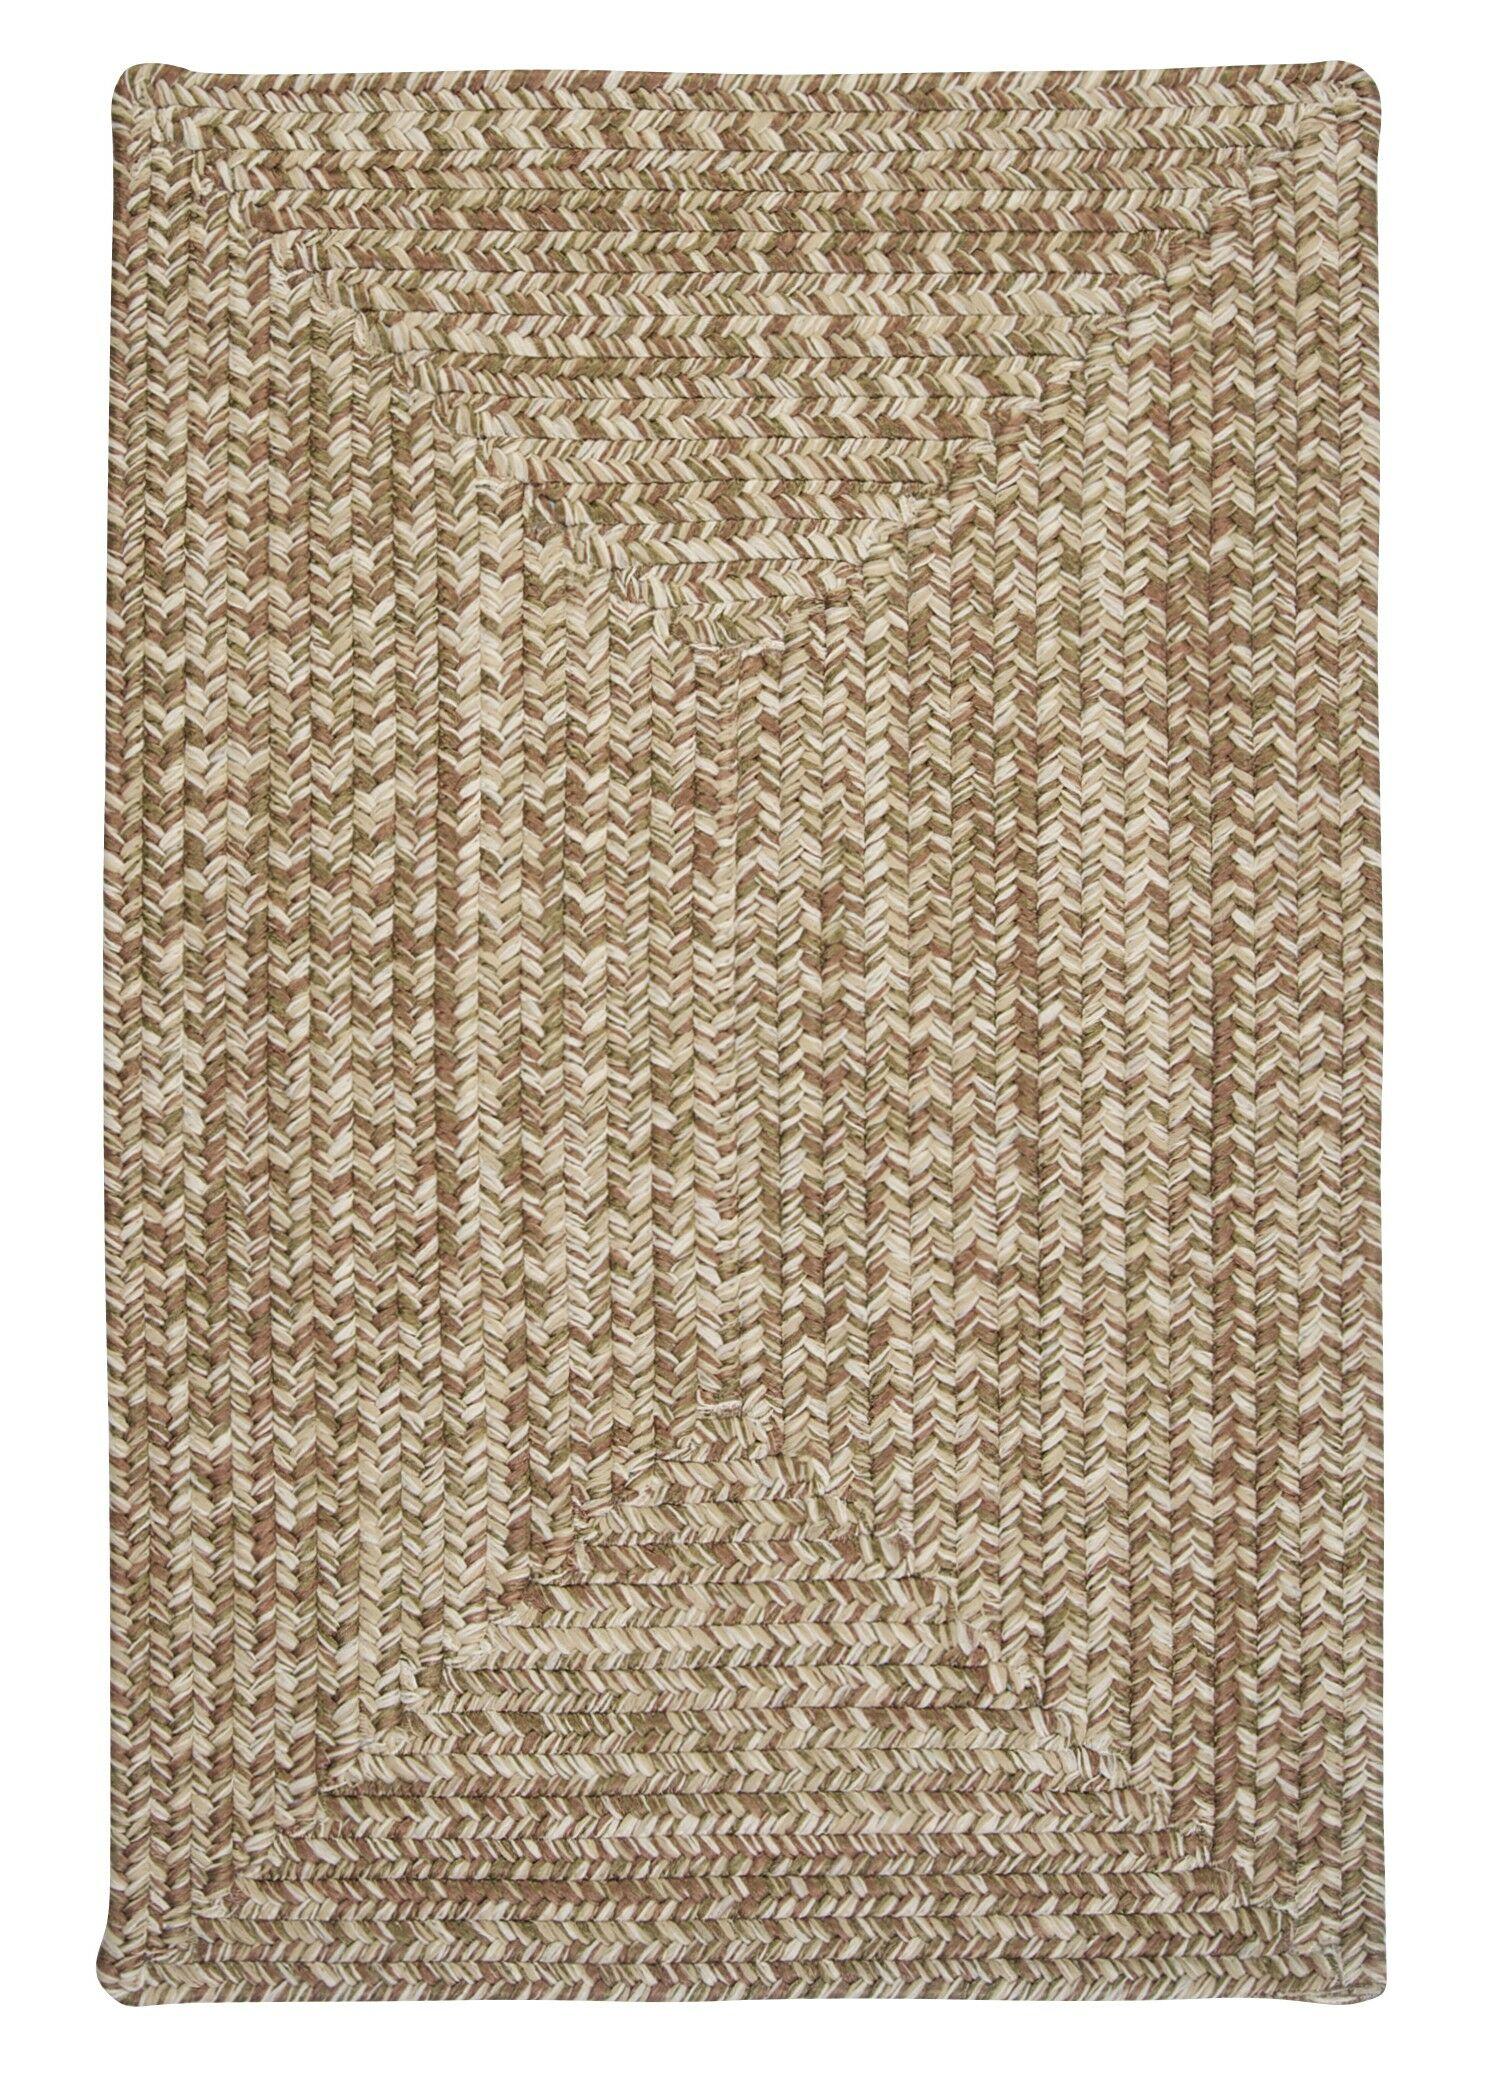 Beltran Moss Green Rug Rug Size: Rectangle 10' x 13'